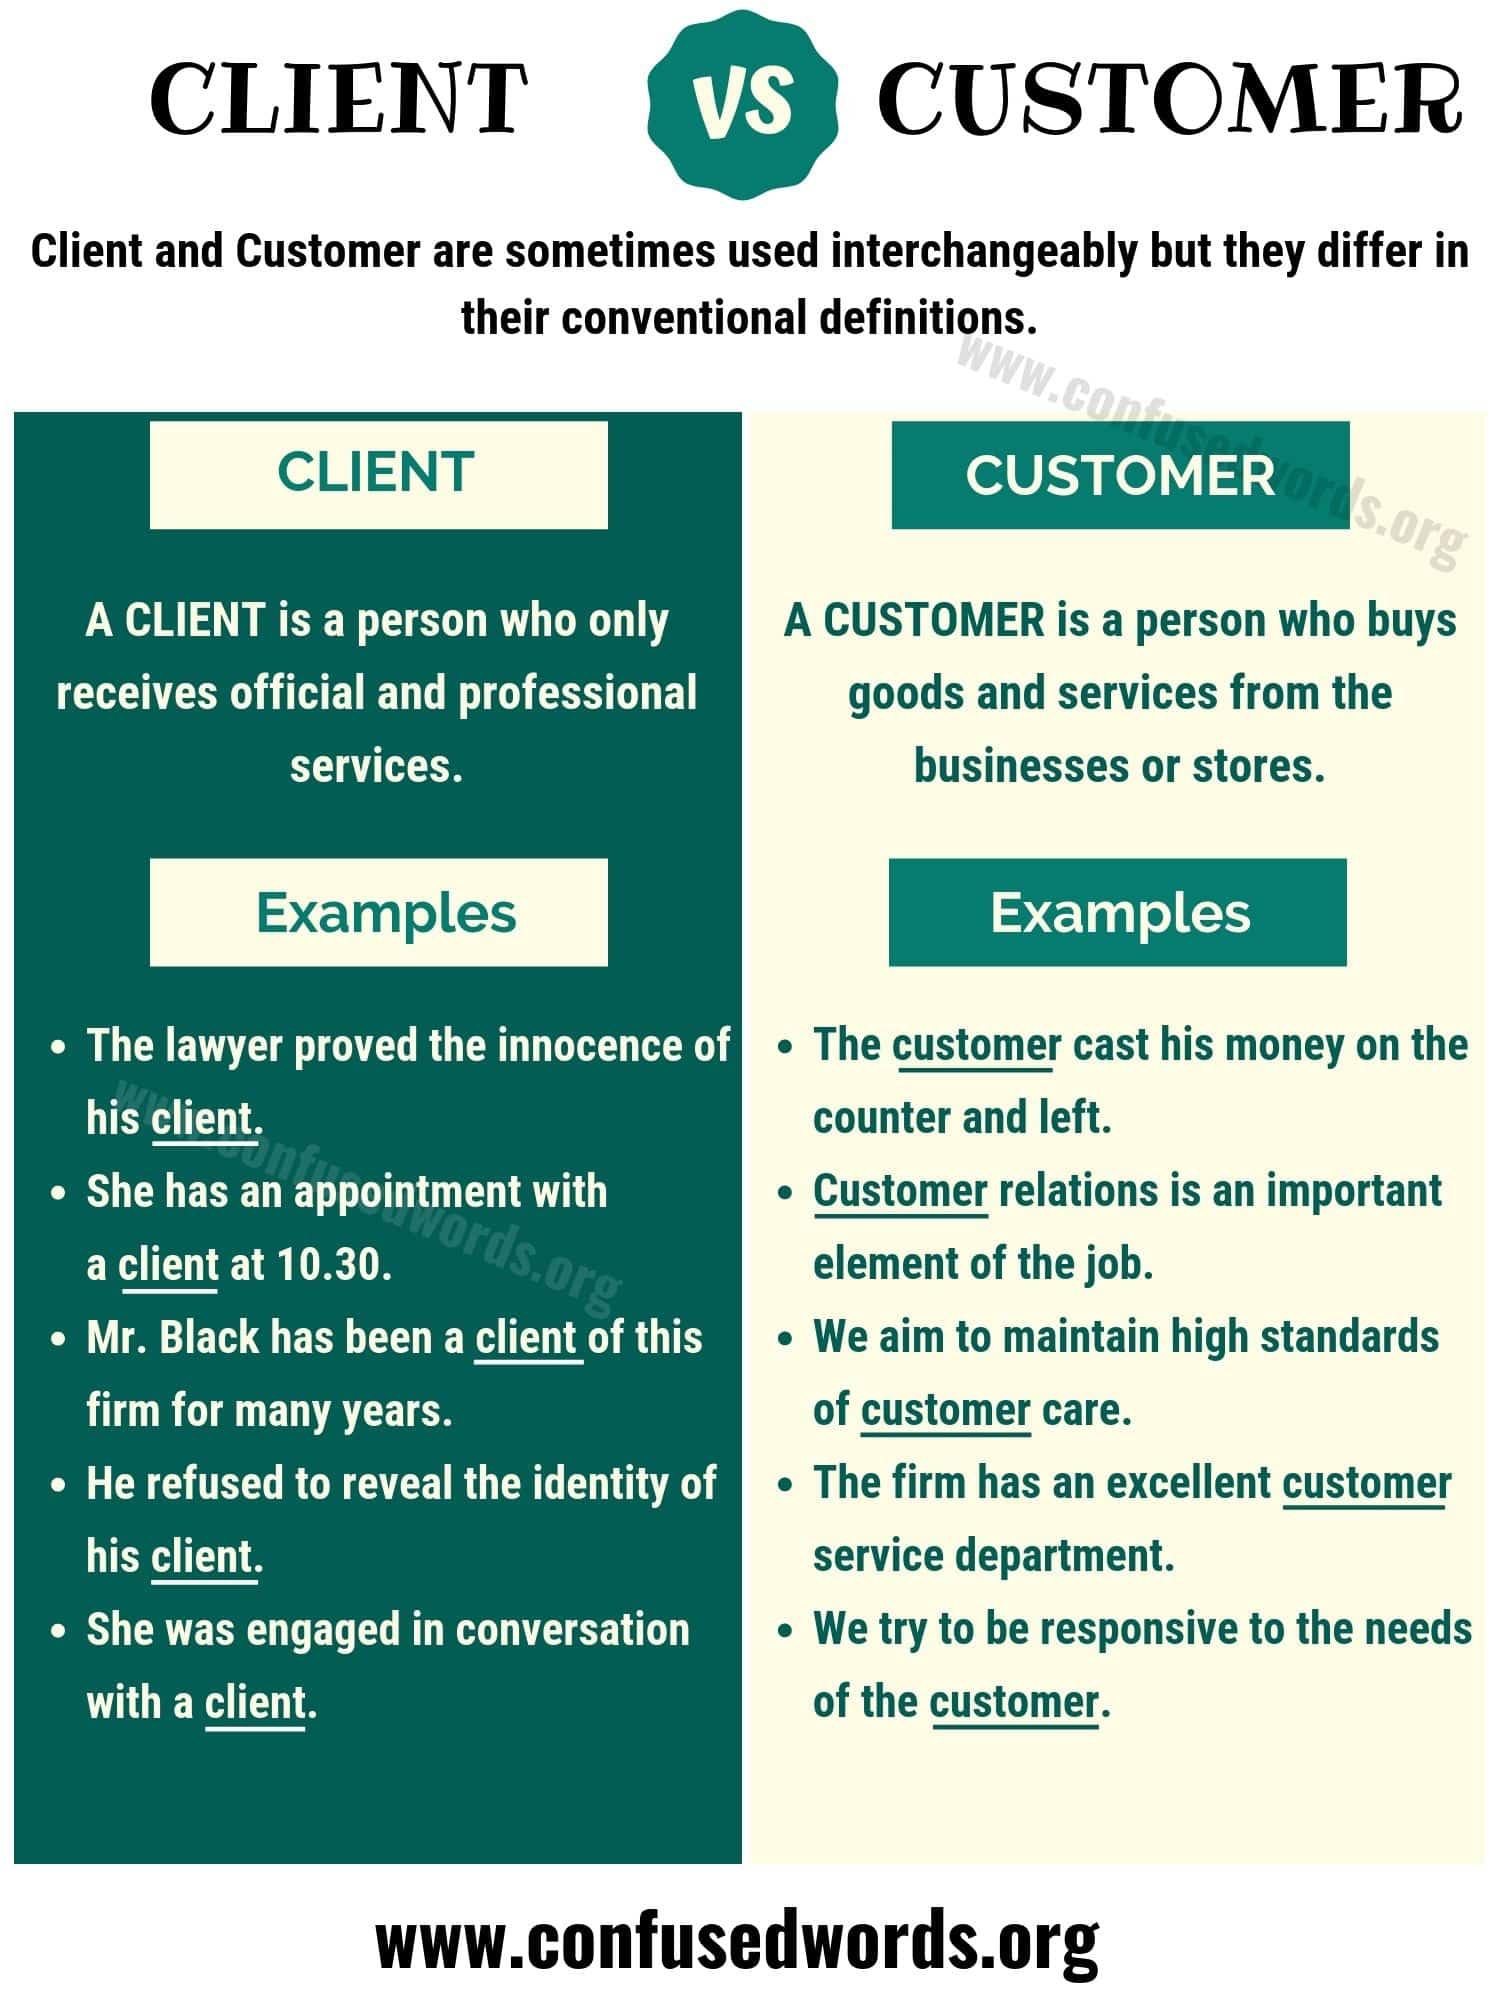 Client vs Customer